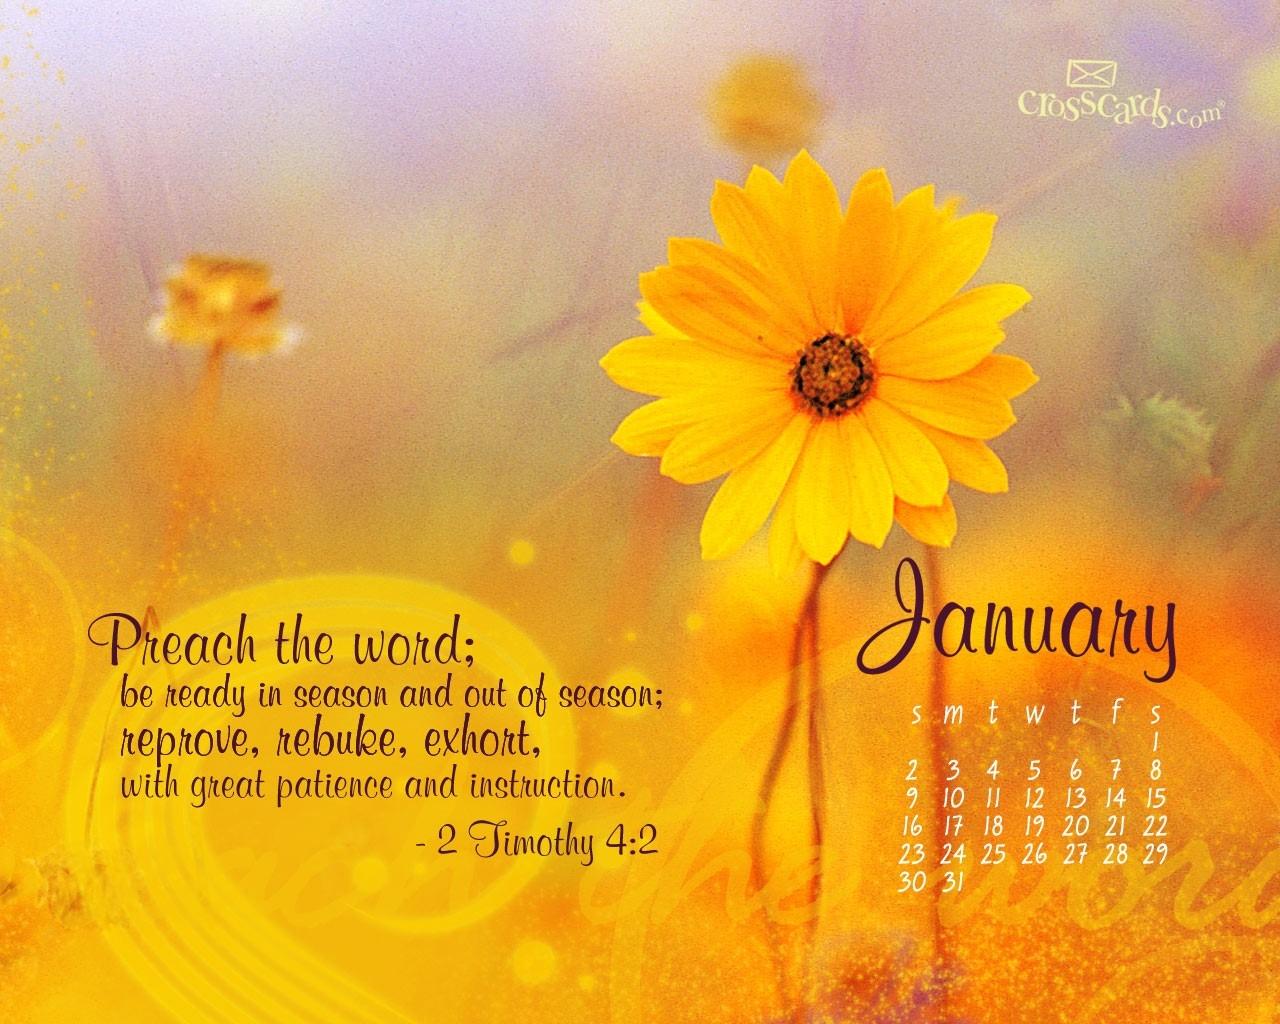 January 2011 2 Timothy 42 Desktop Calendar Free January Wallpaper  Xjb